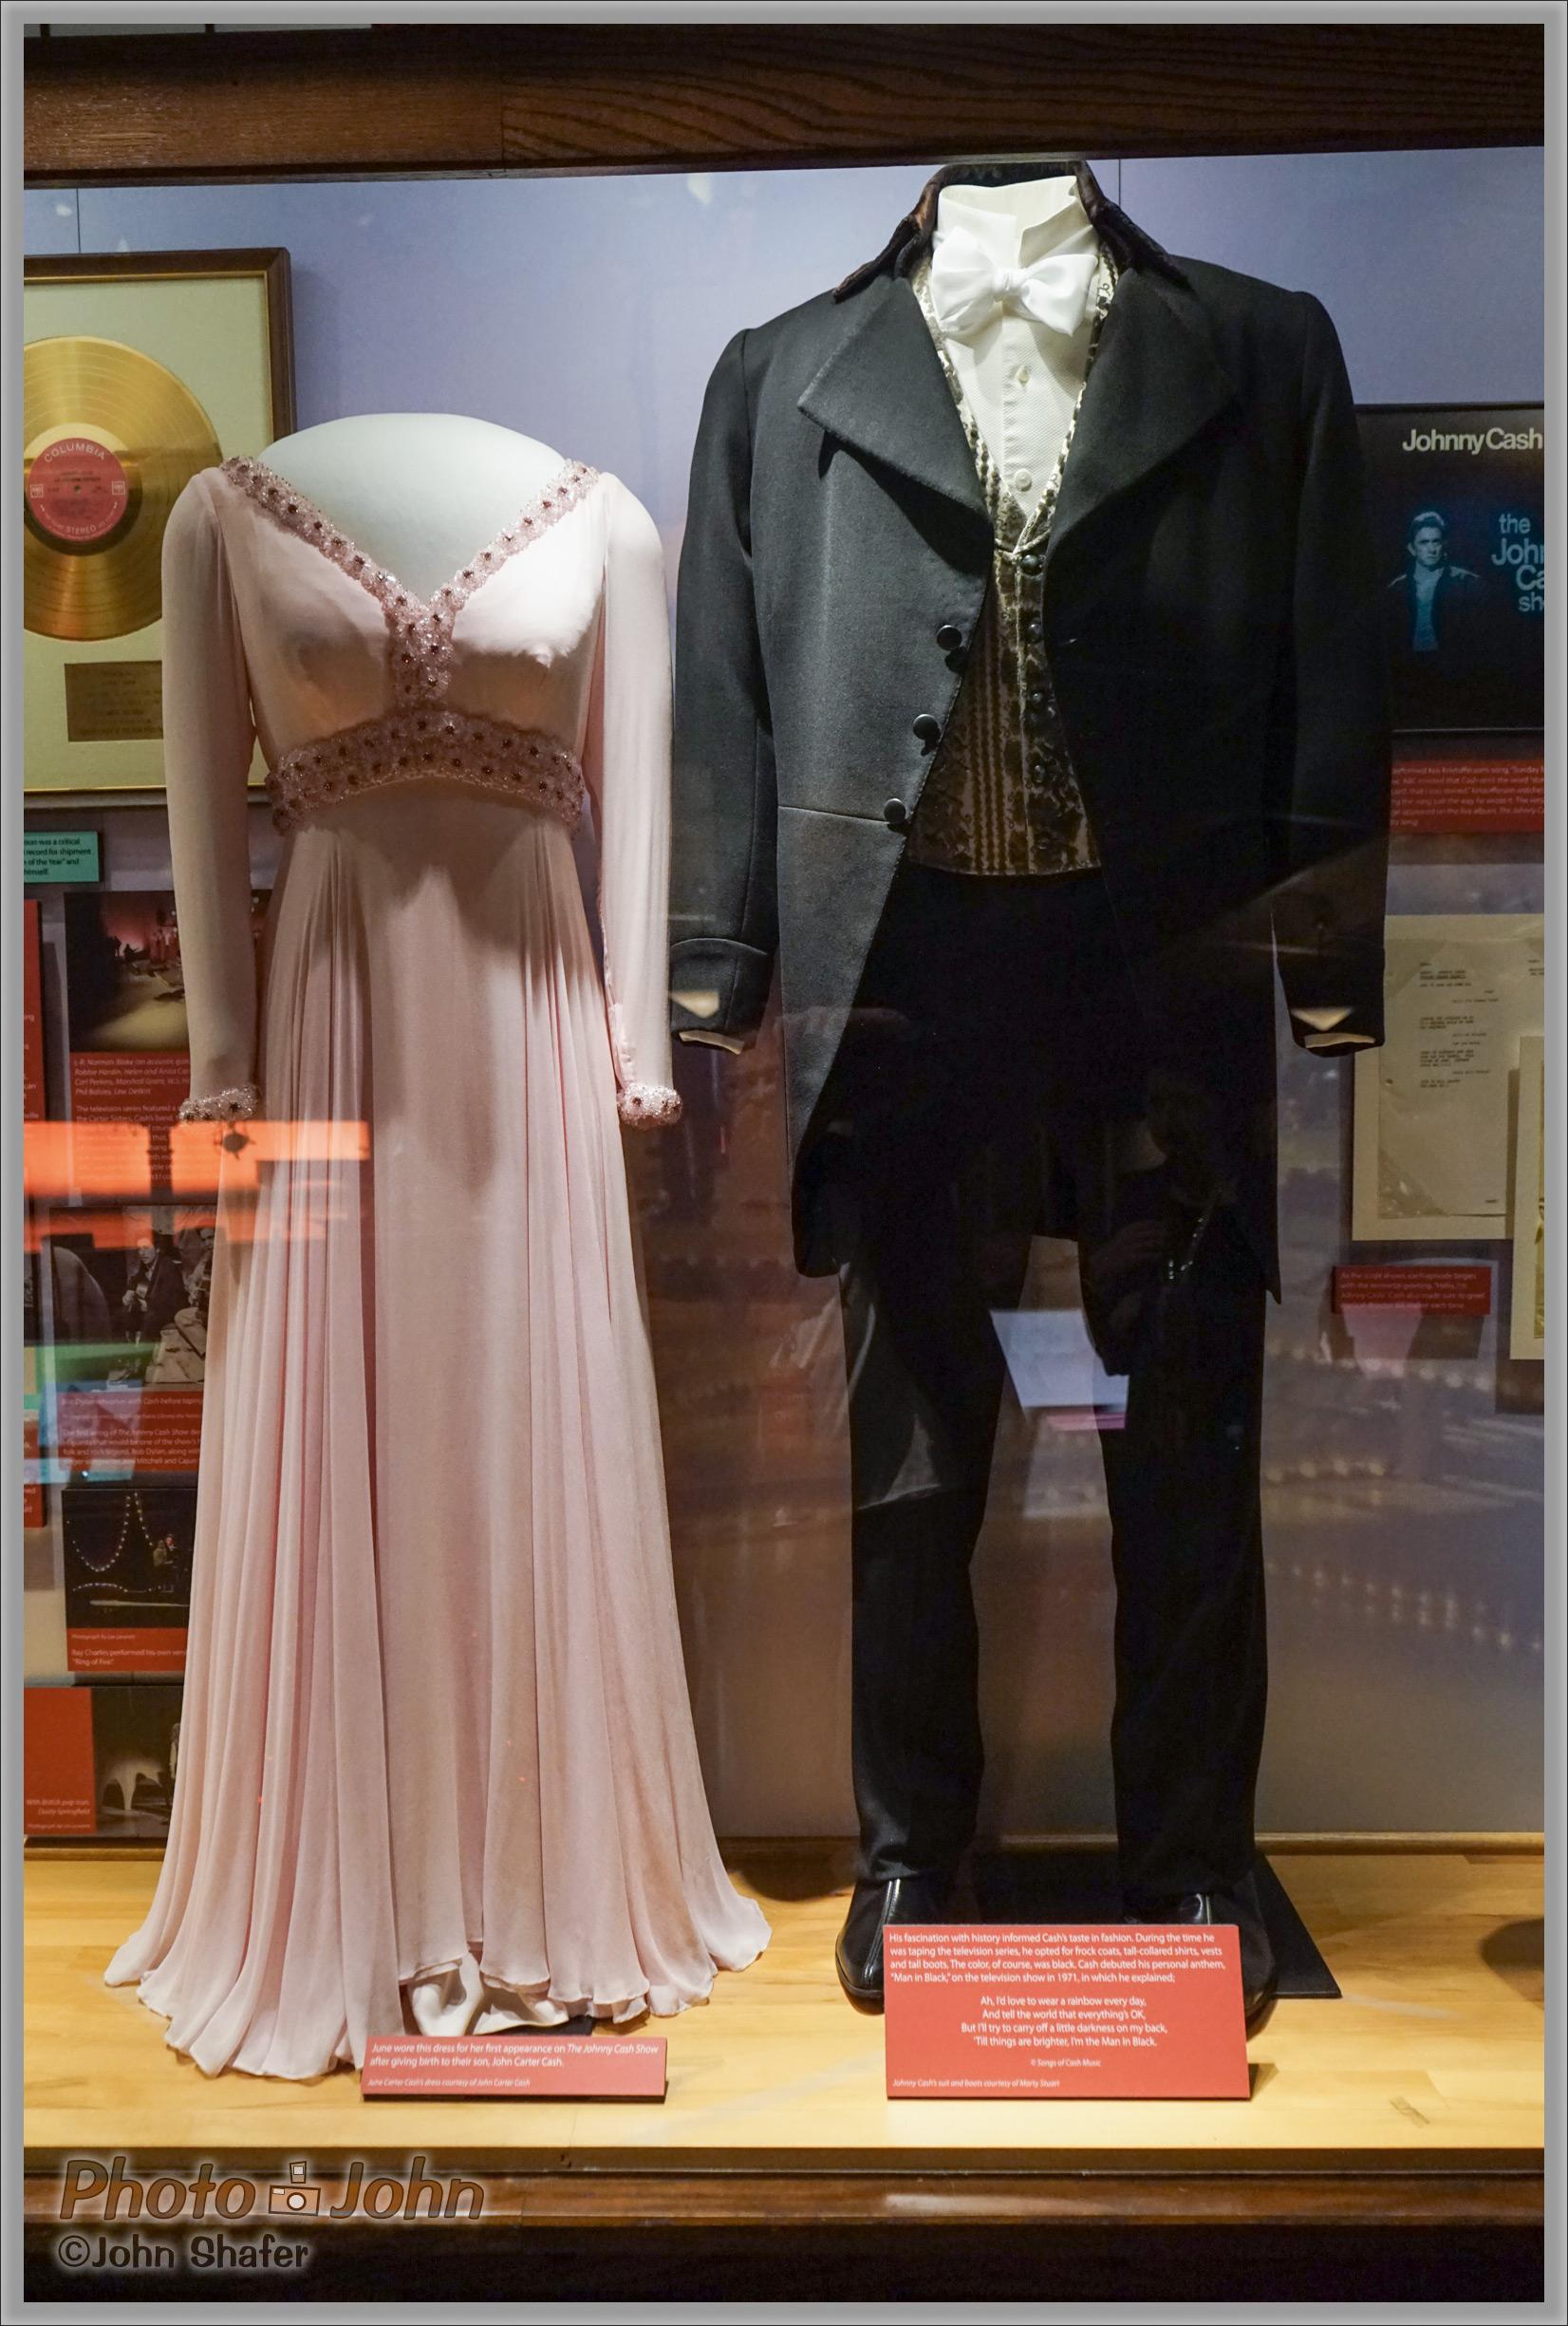 Sony Alpha A7R - June Carter & Johnny Cash's Clothes - Ryman Auditorium